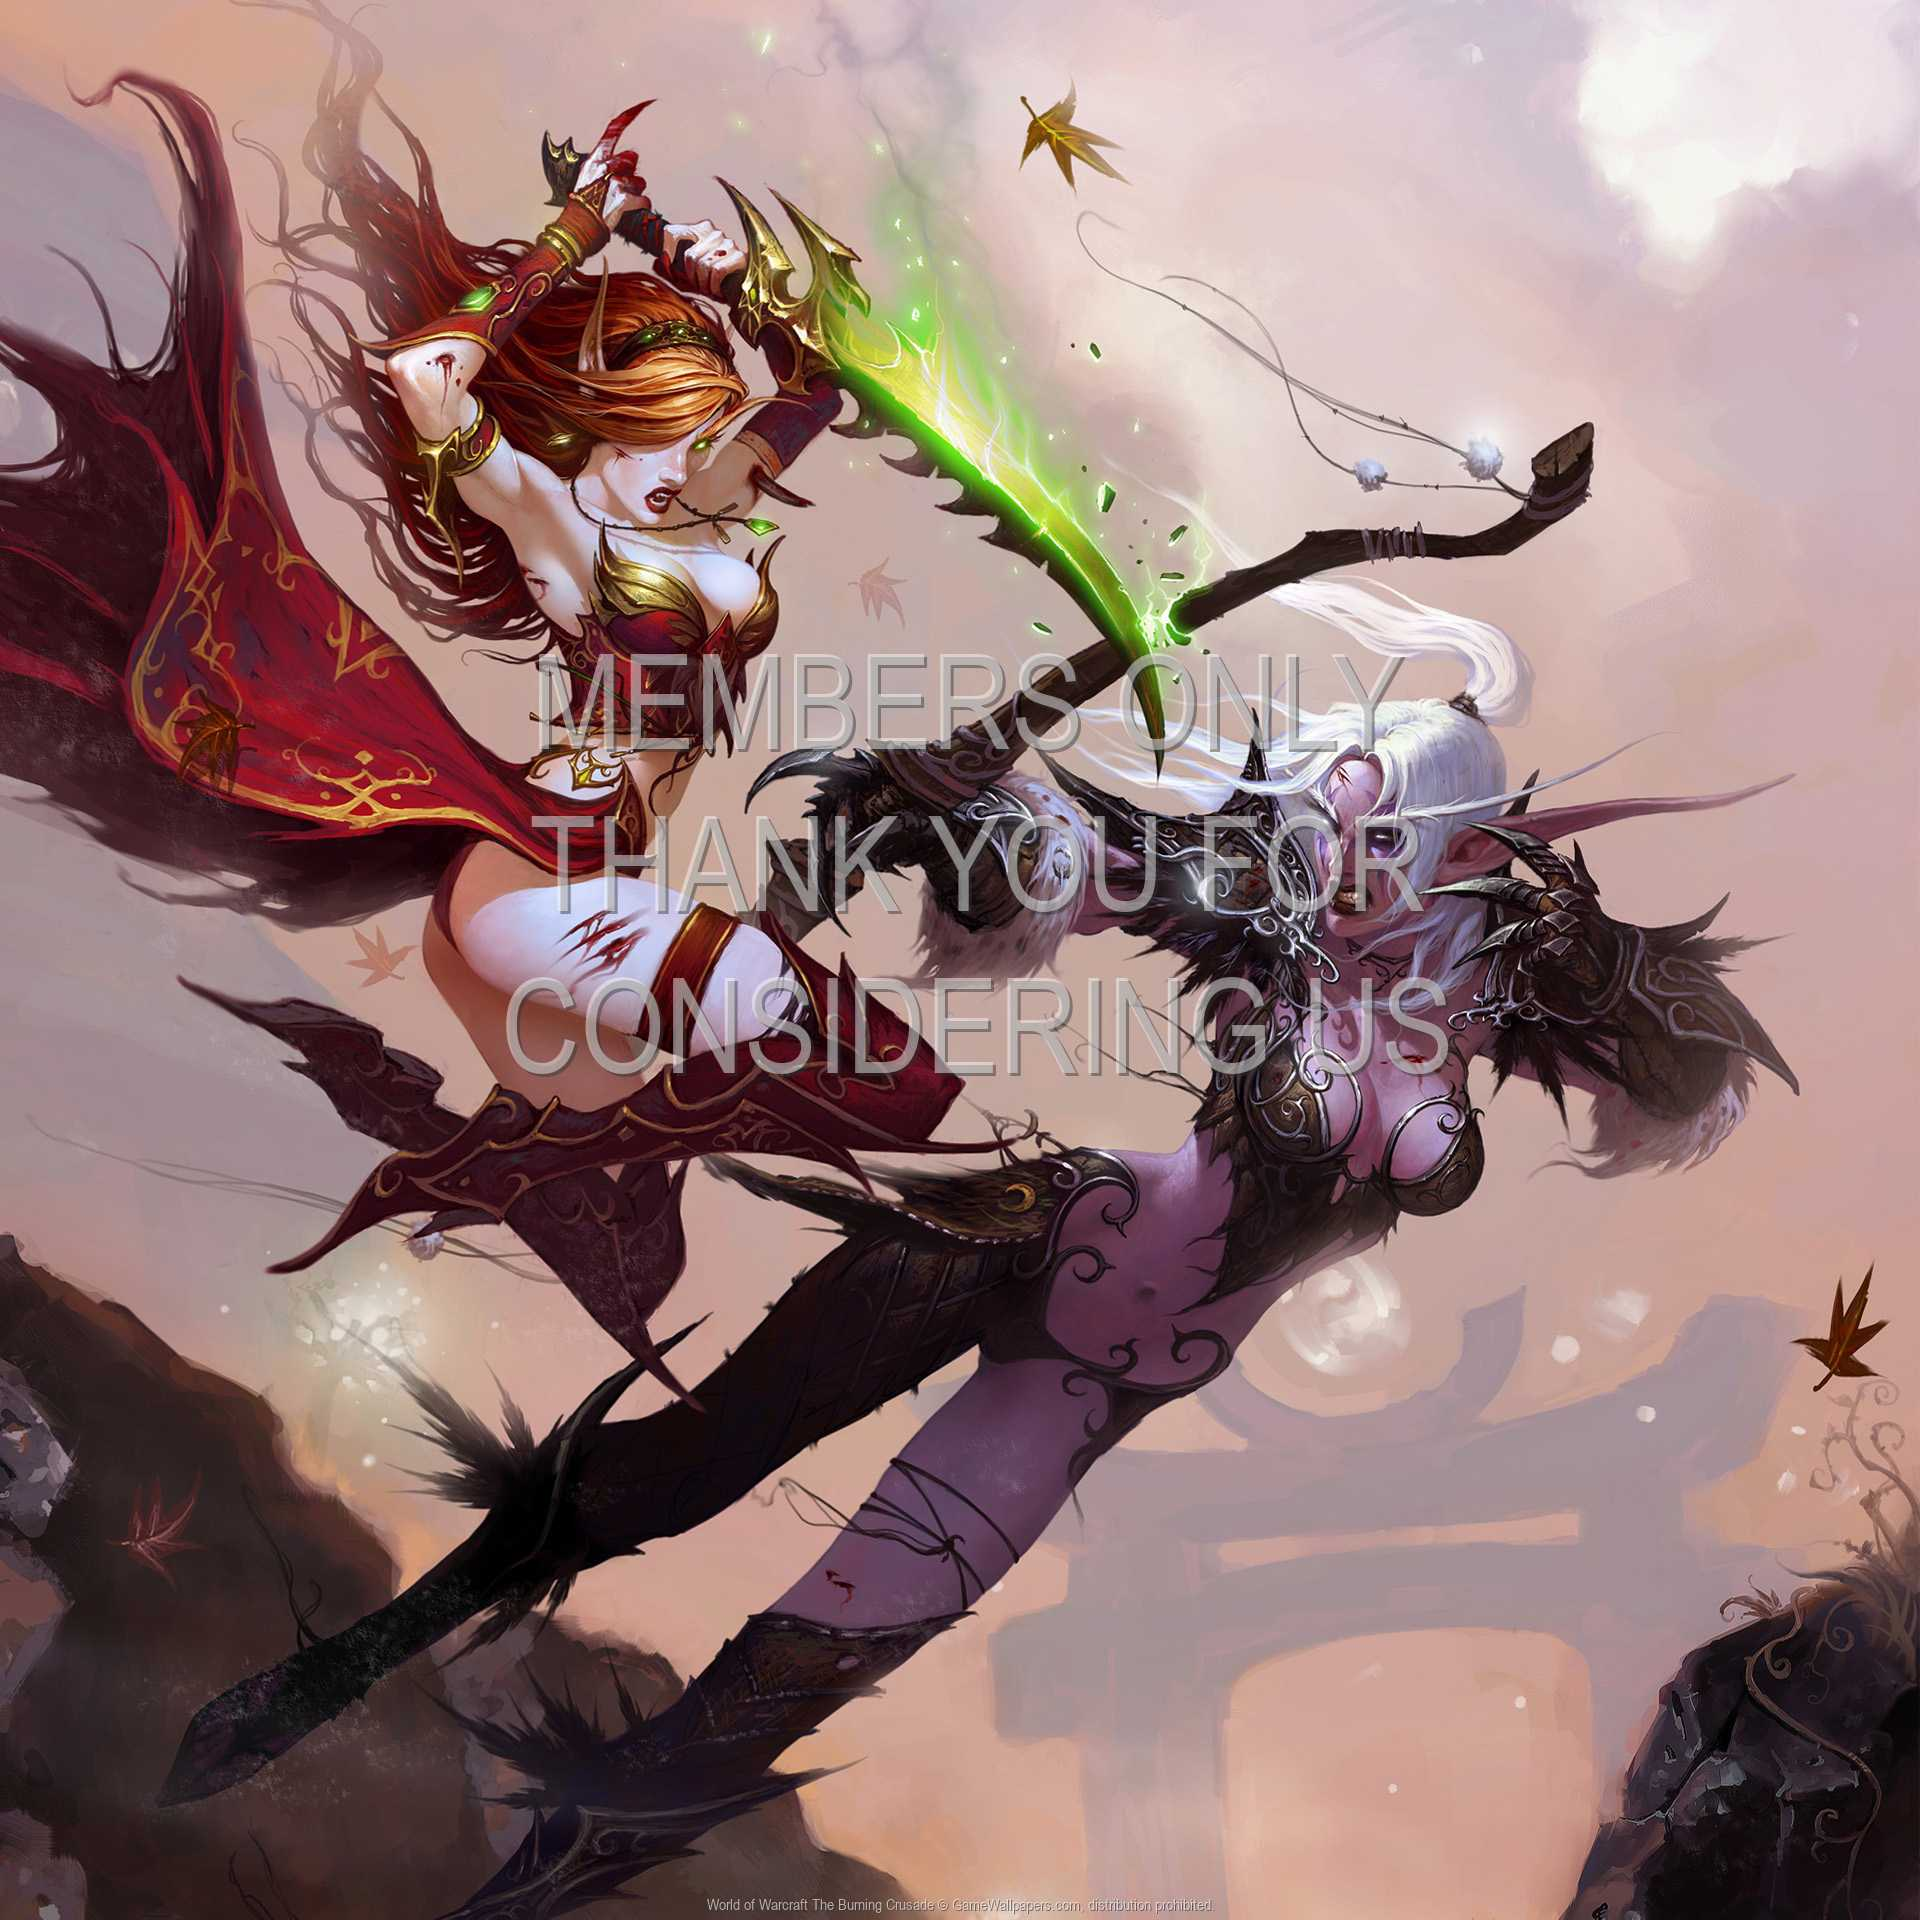 World of Warcraft: The Burning Crusade 1080p Horizontal Handy Hintergrundbild 08